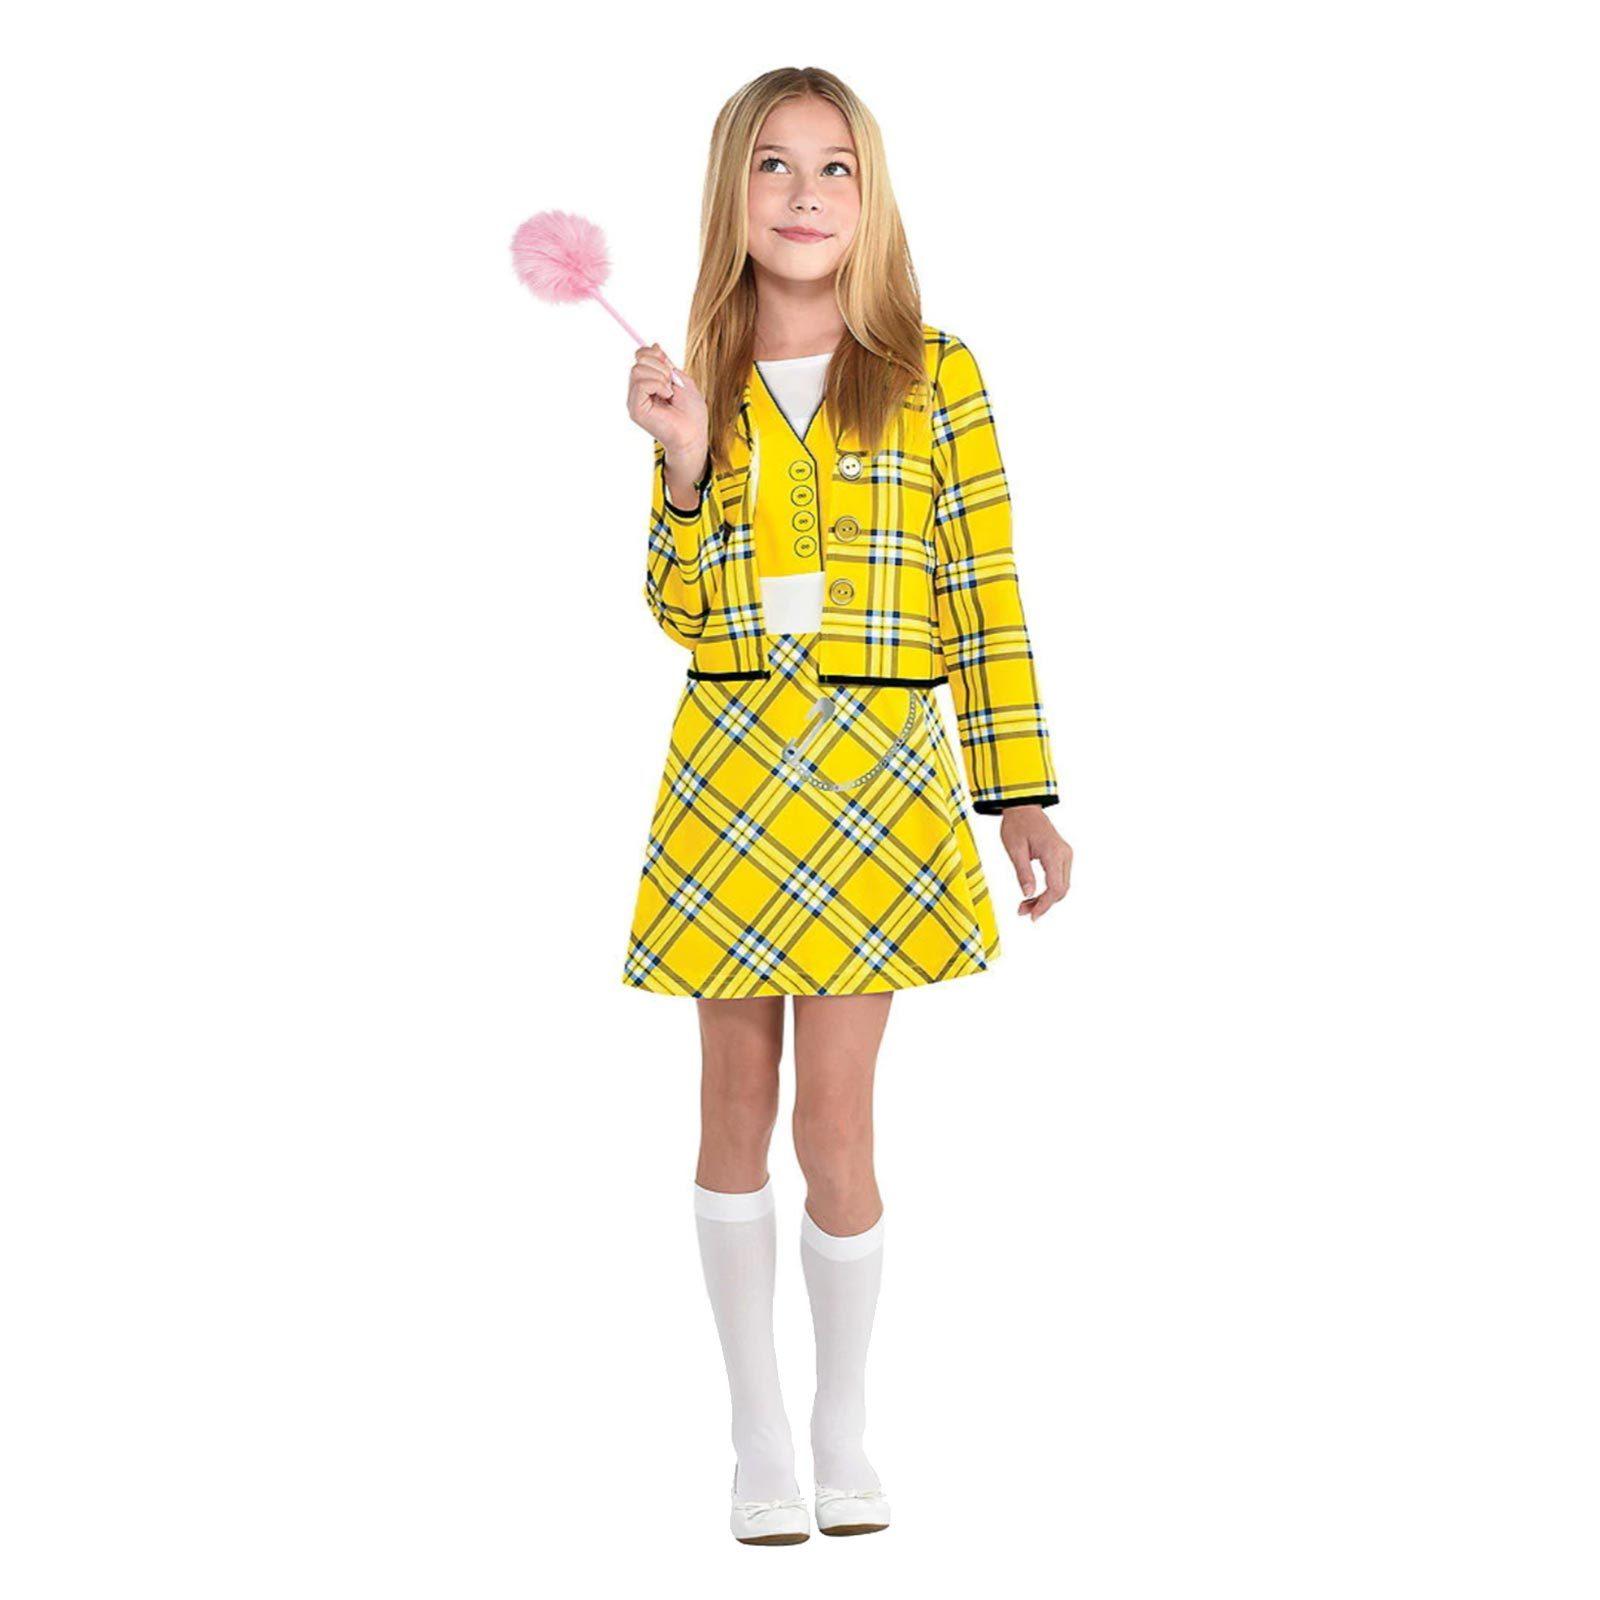 Cher Halloween costume